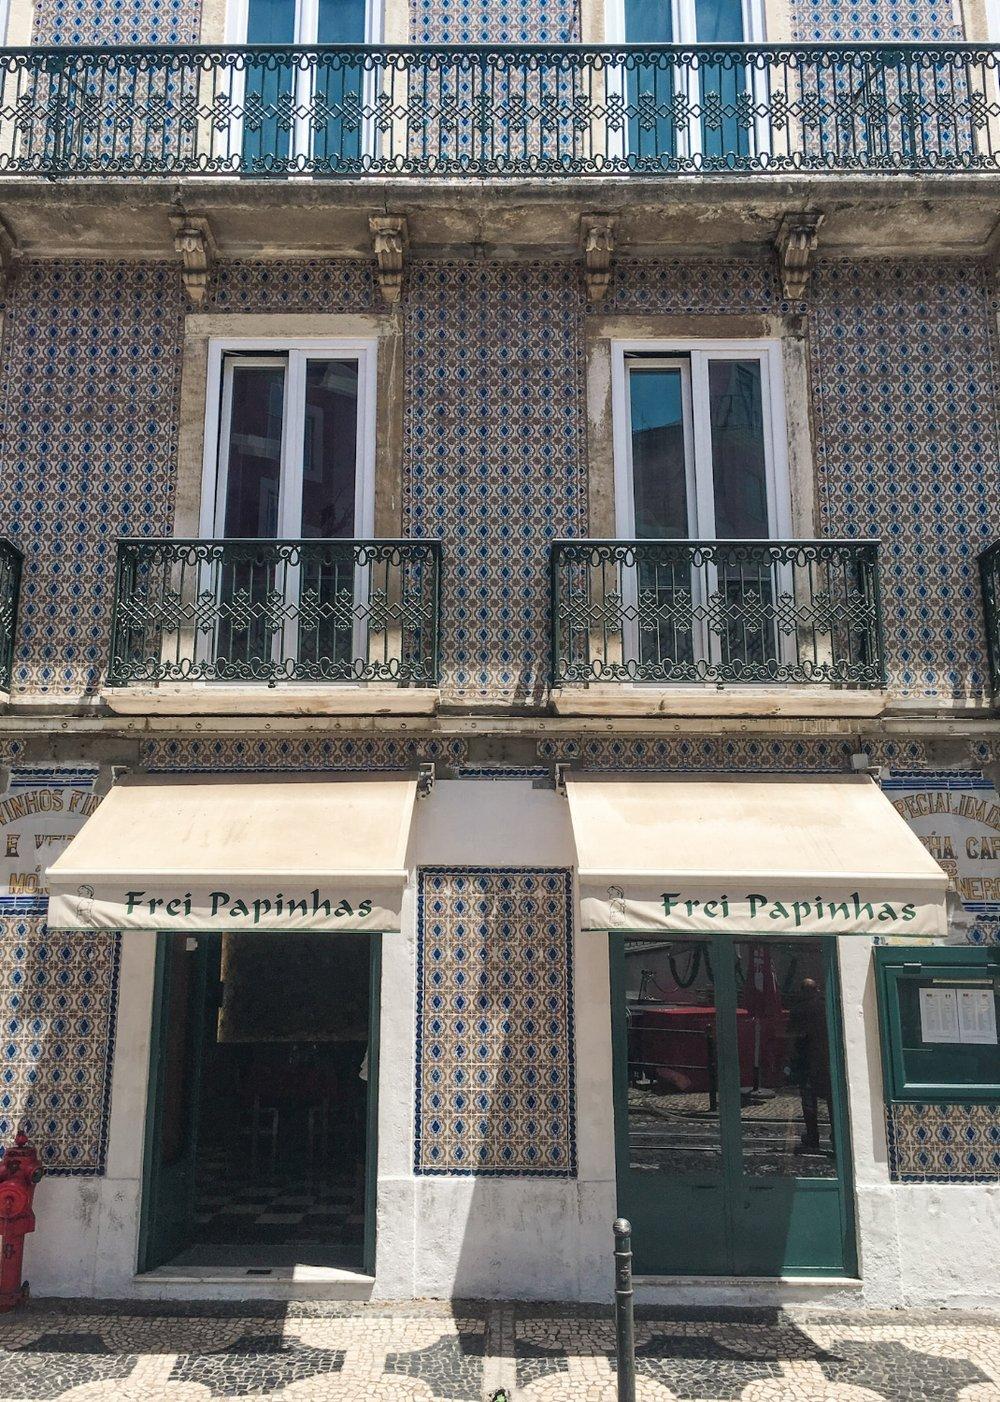 curio.trips.portugal.lisbon.architecture.jpg